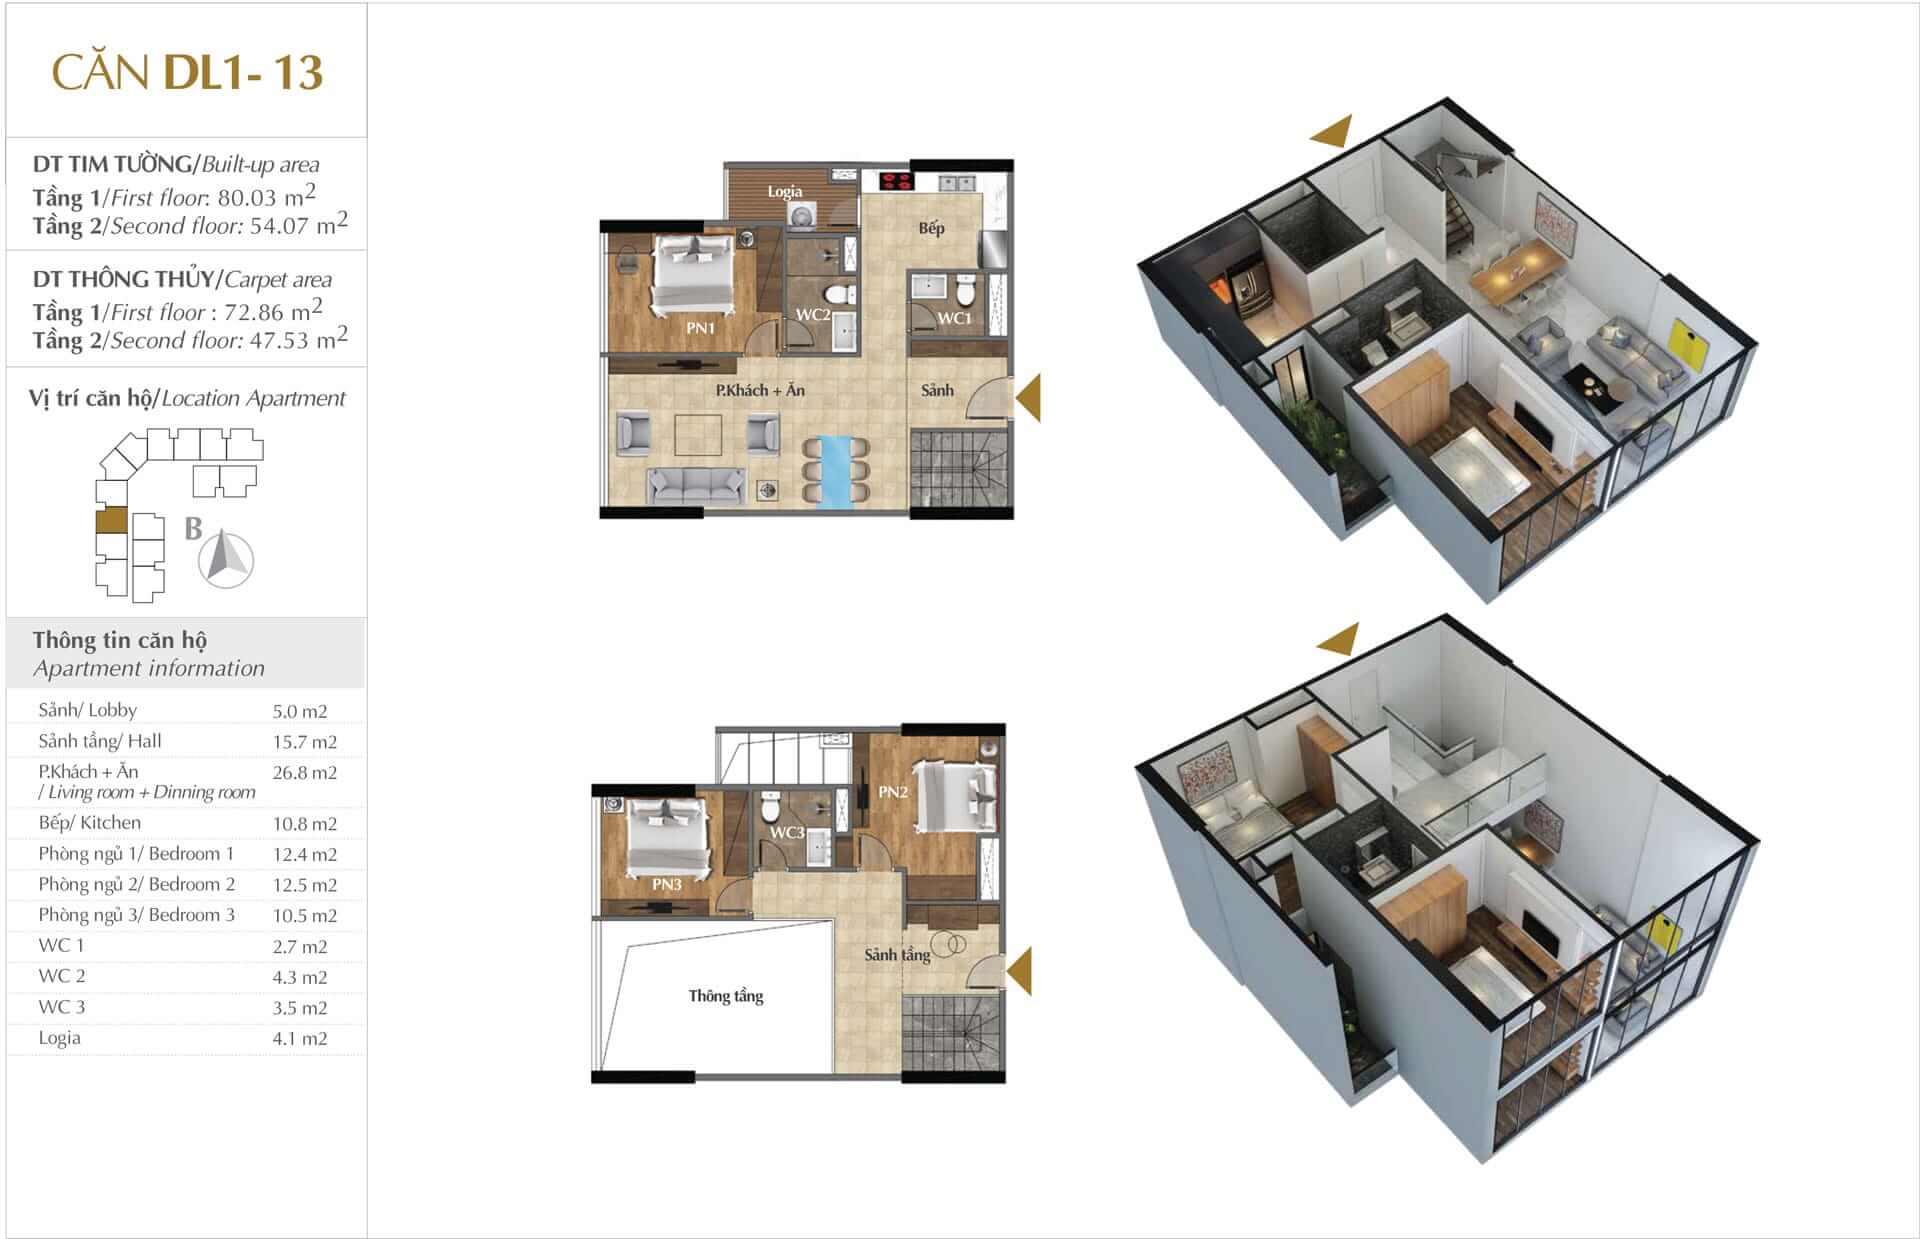 Thiết kế căn DL1 - 13